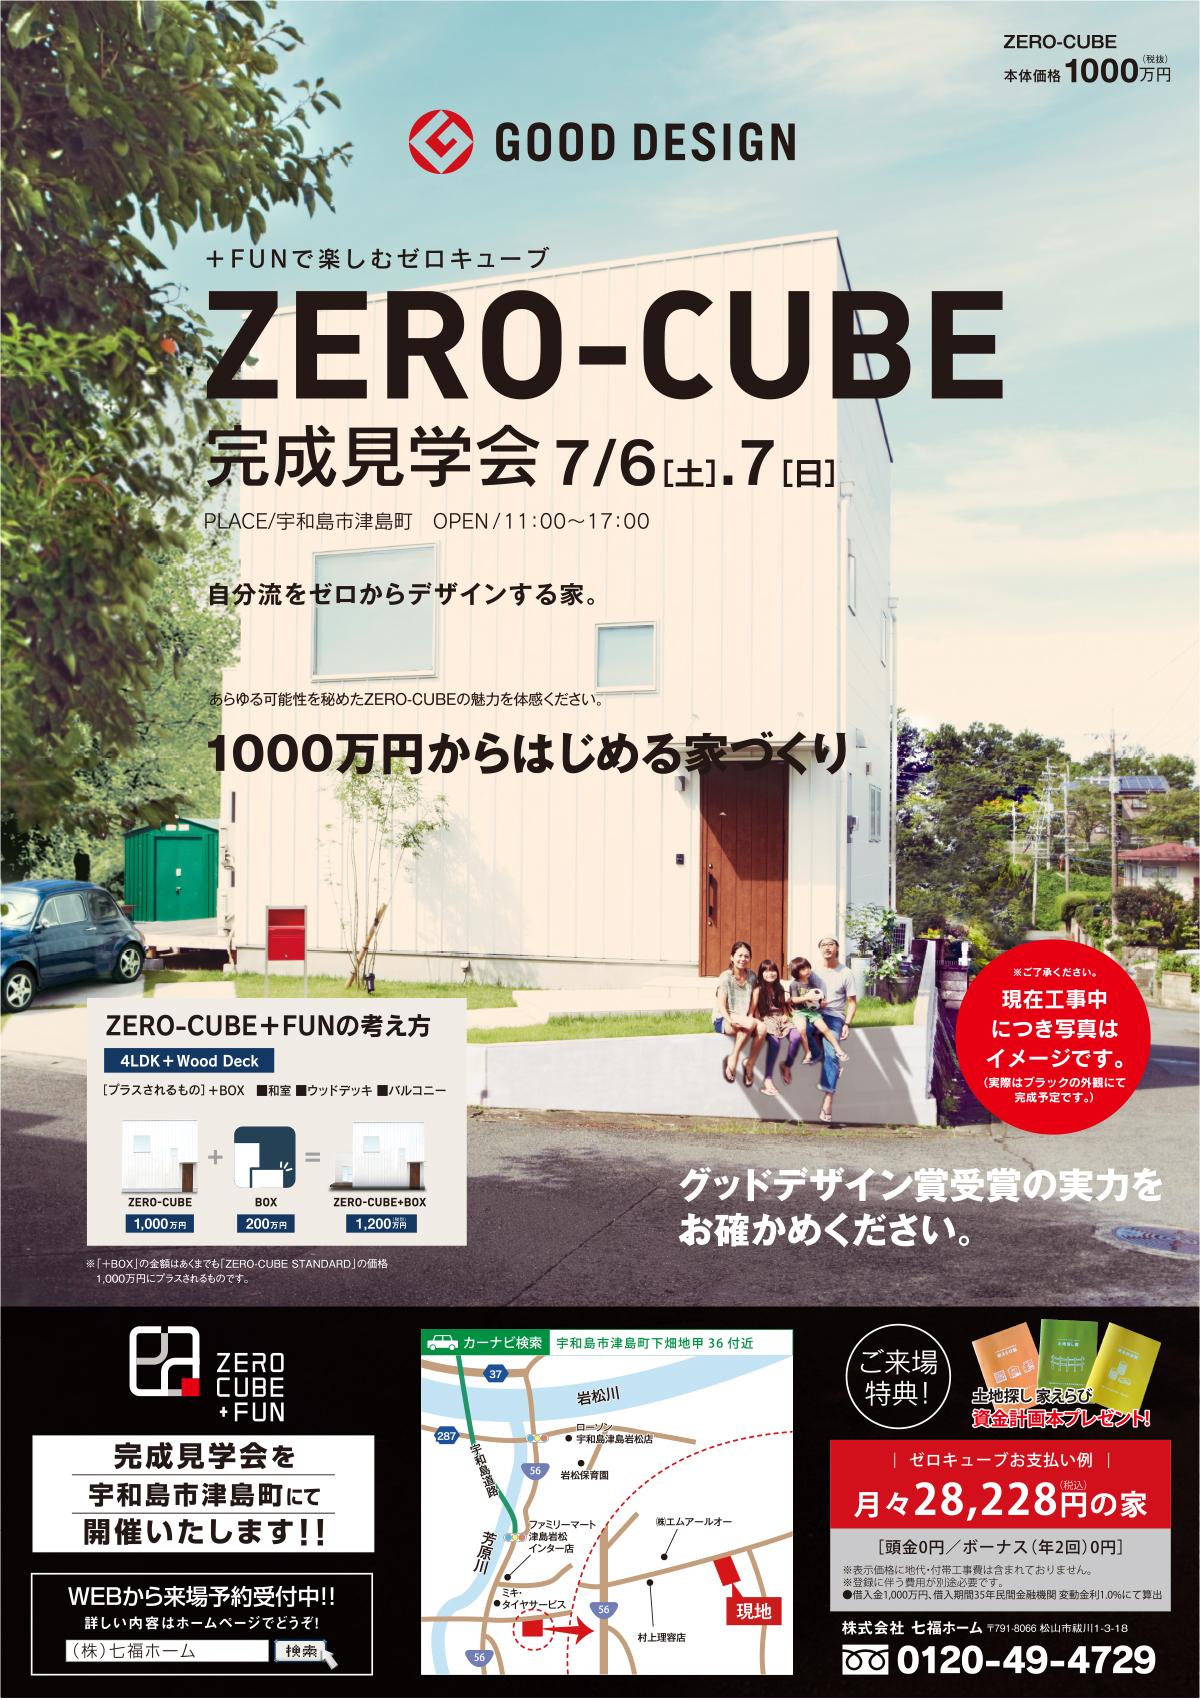 7/6(土)7(日)は宇和島市津島町でZERO-CUBE完成見学会!